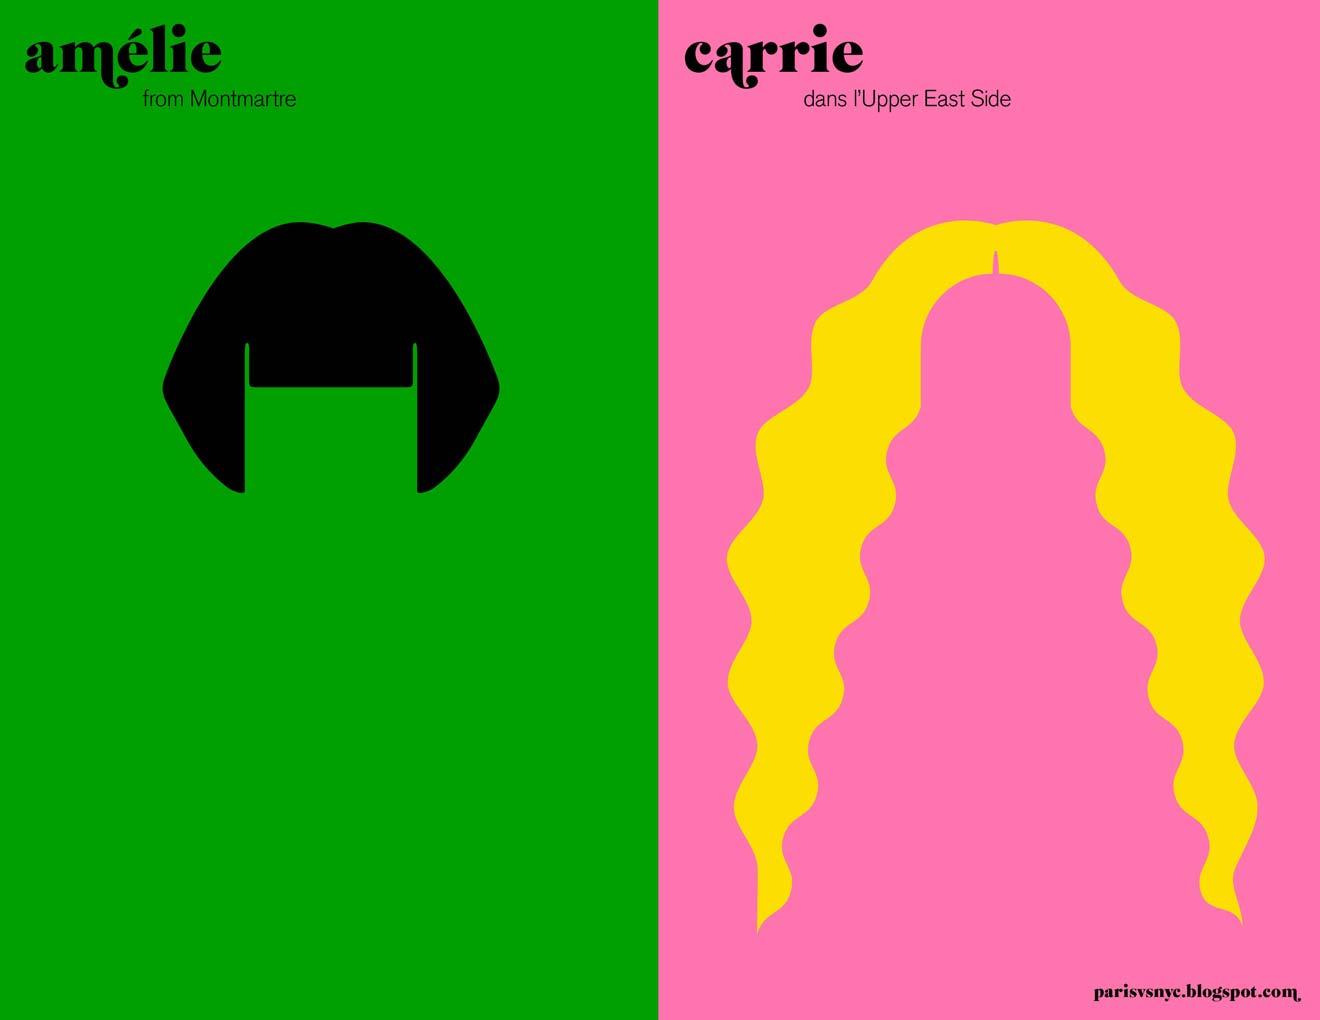 amelie carrie paris vs new york